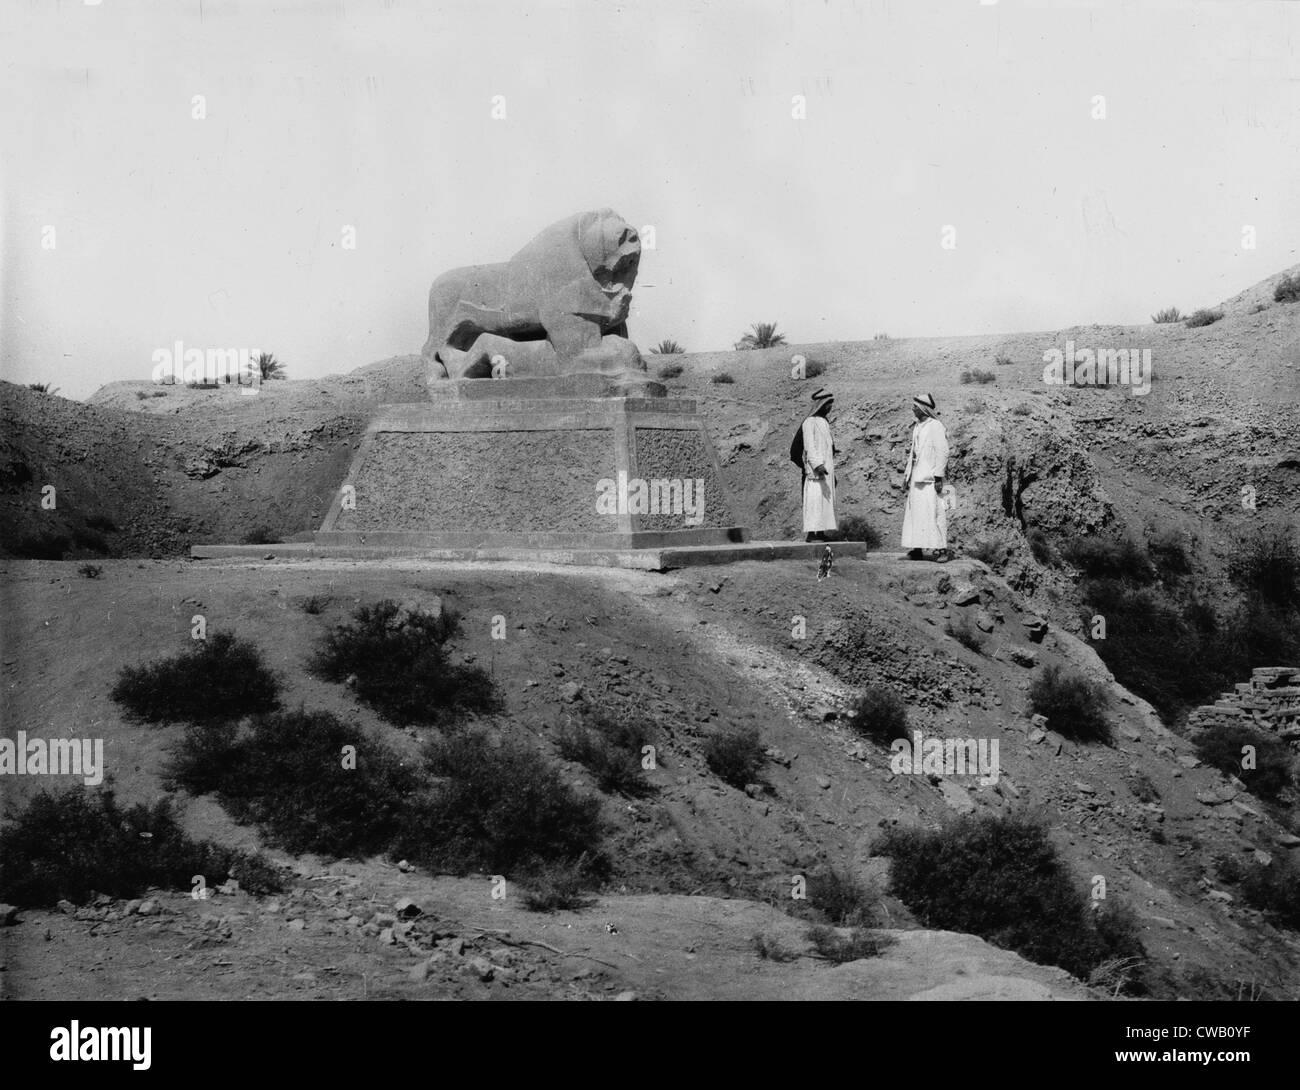 Babylon, Basalt lion, Iraq, circa 1932. Stock Photo